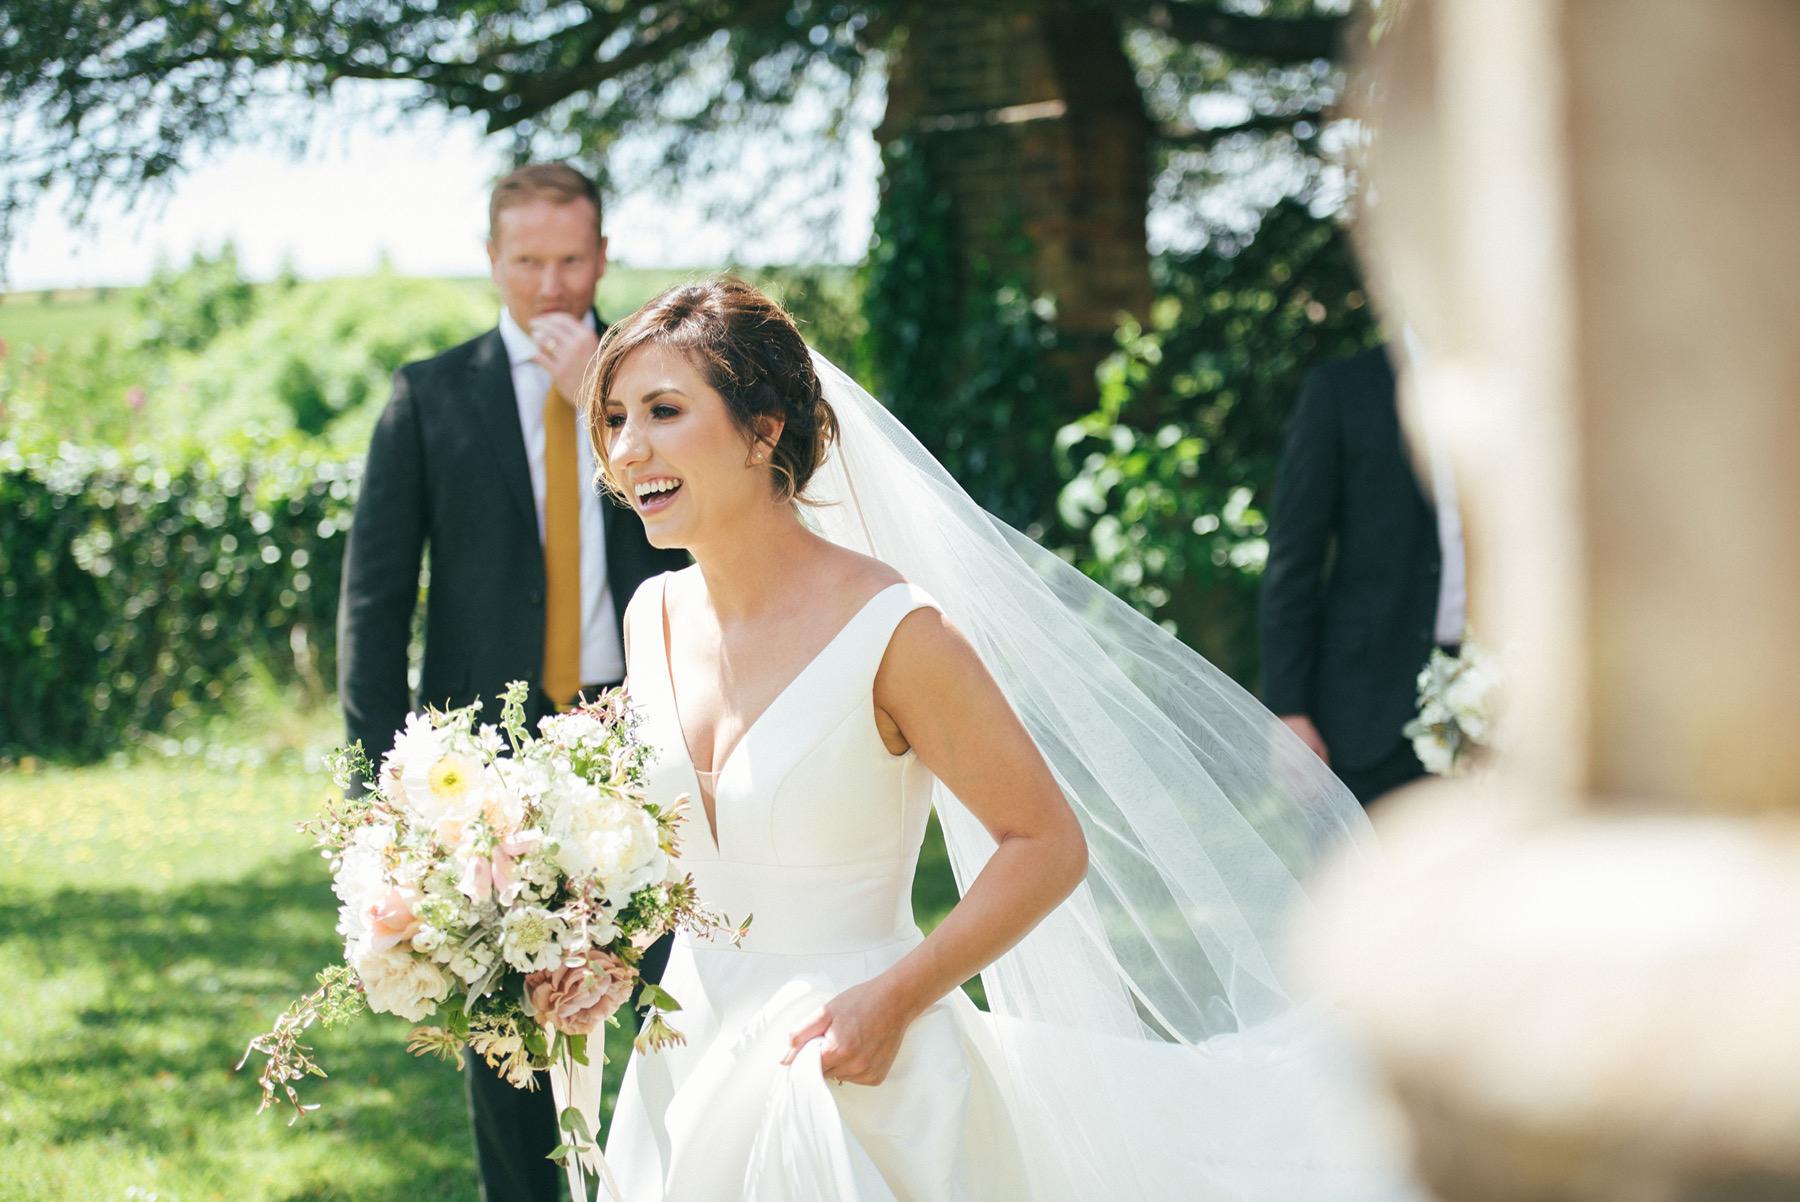 Dorset weddings - british flowers S P I N D L E